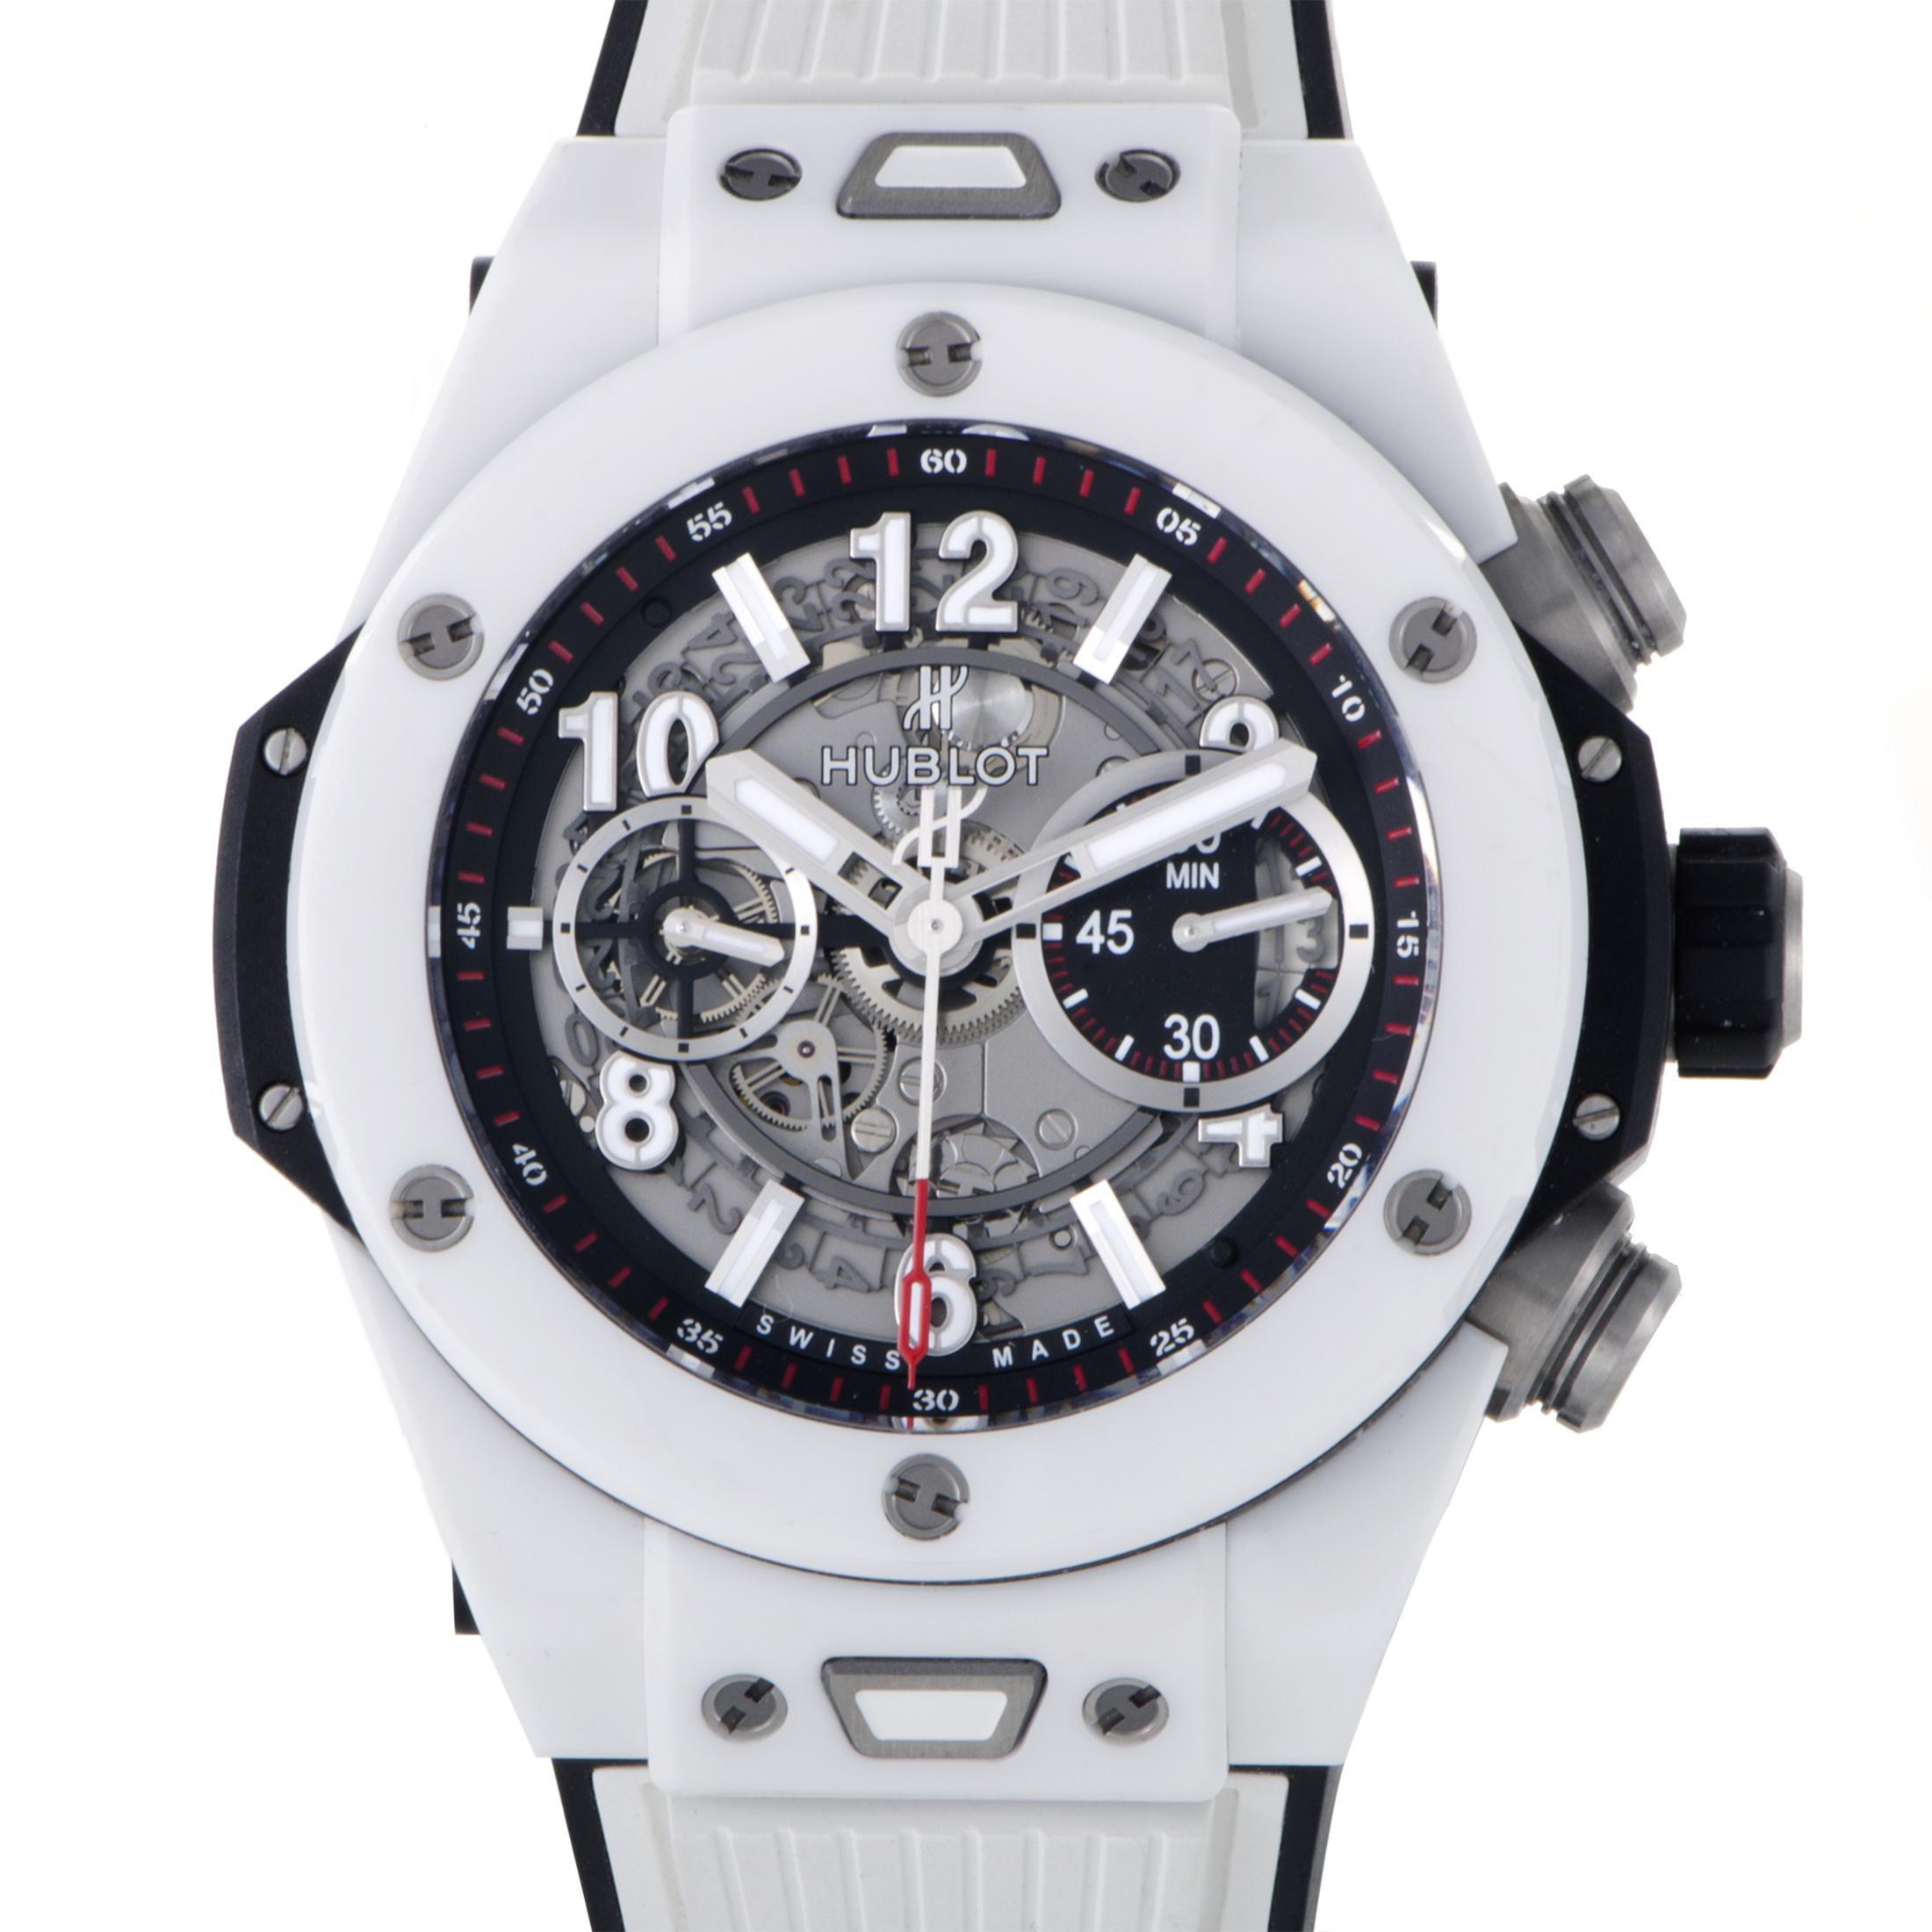 Big Bang Unico White Ceramic Watch 411.HX.1170.RX (Ceramic)